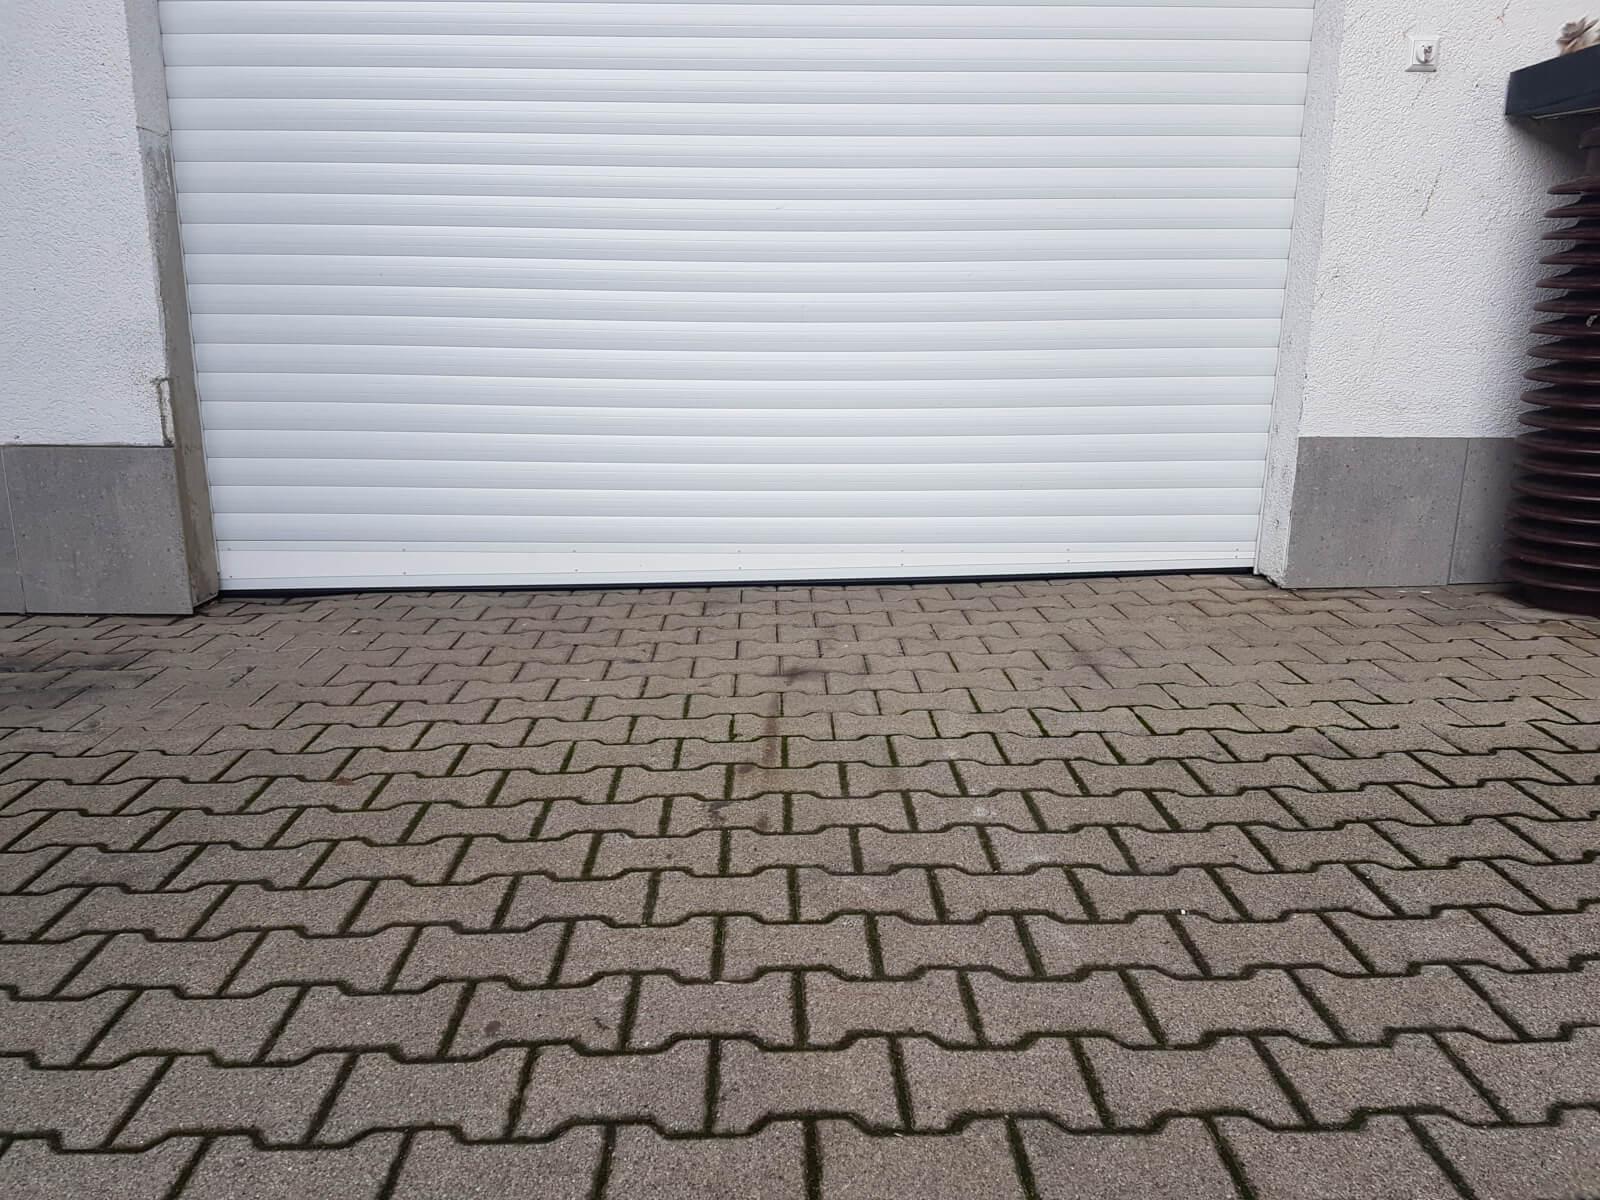 garage_garagentor_weiss_wand_hauswand